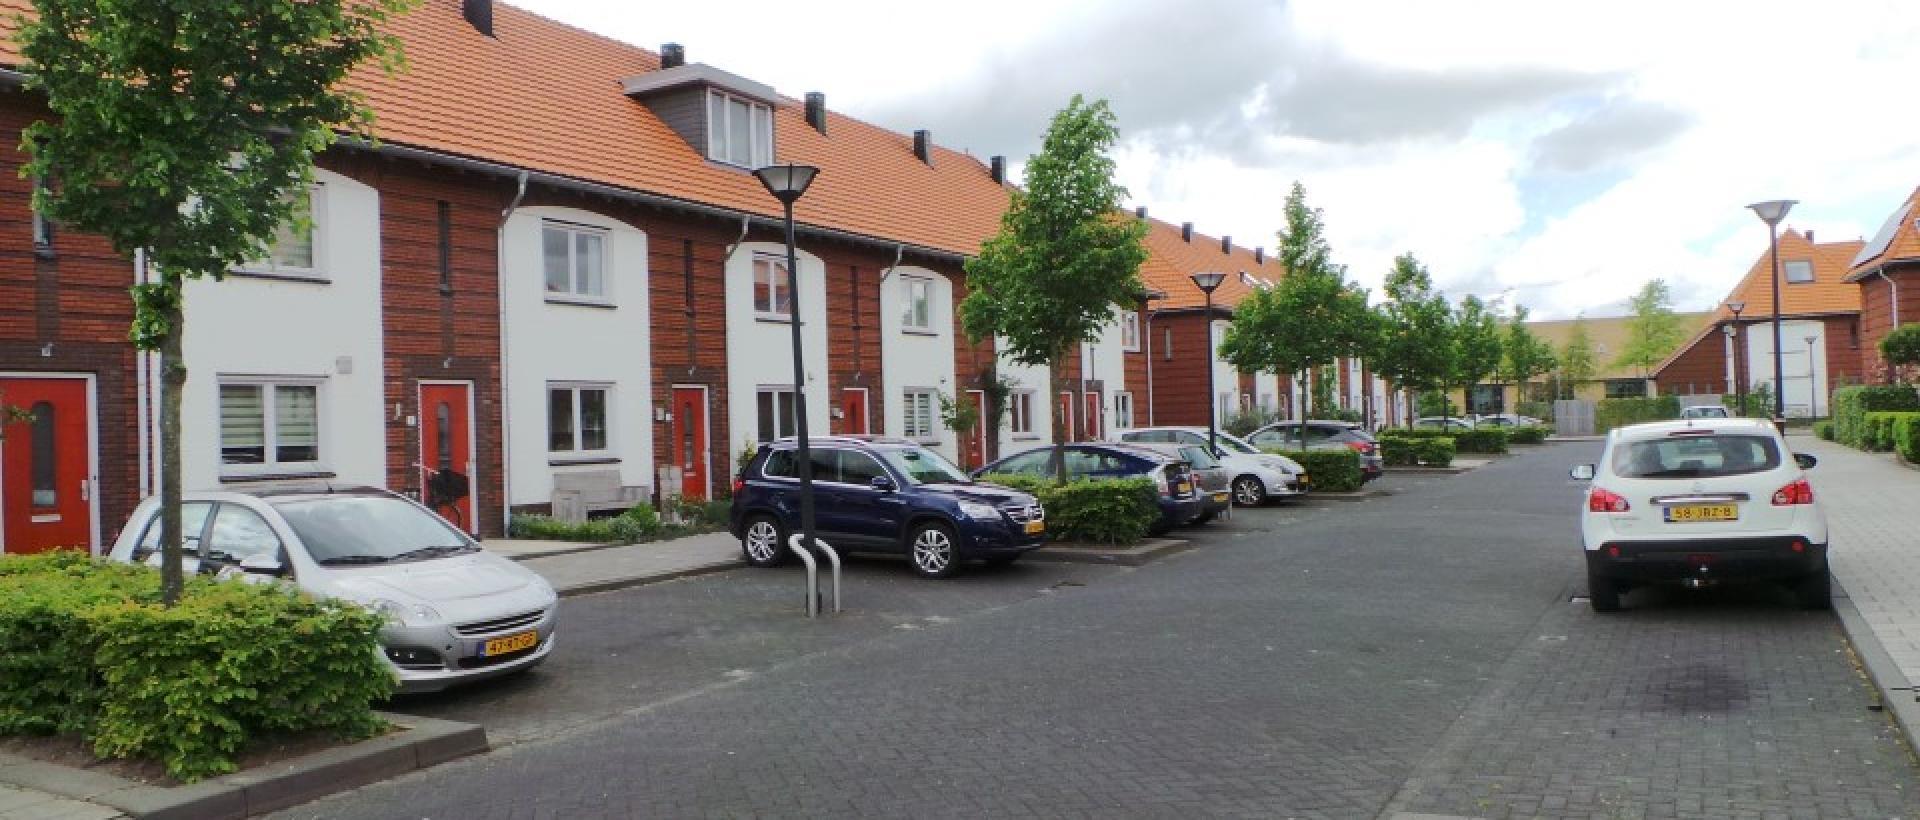 https://www.rivarentals.com/images-houses-apartments/capelle-aan-den-ijssel/fascinatio/18583/1920x820/family-house-capelle-aan-den-ijssel-charactostraat.jpg